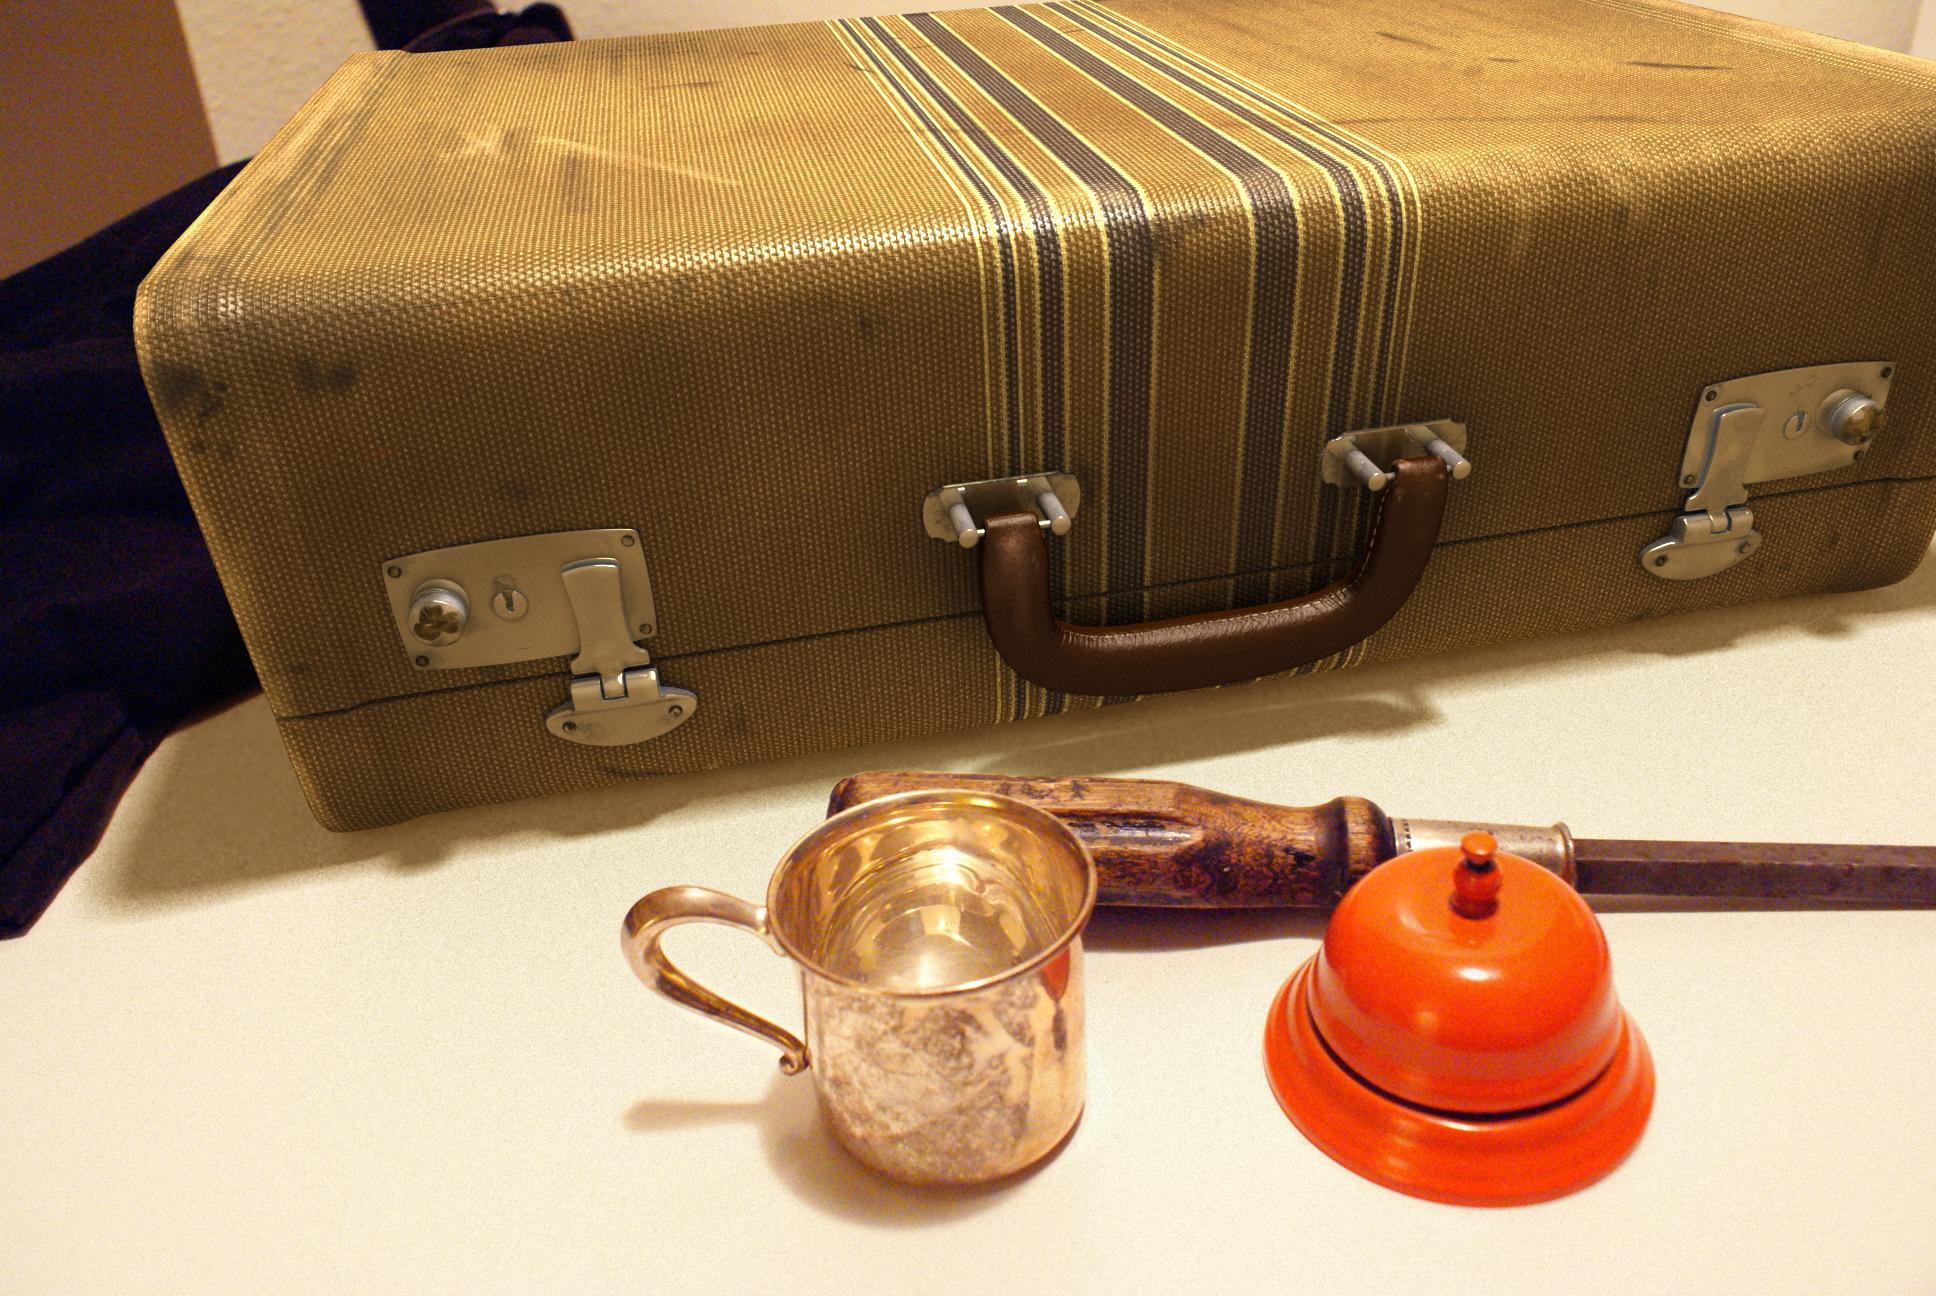 Final Suitcase Composited Into Scene